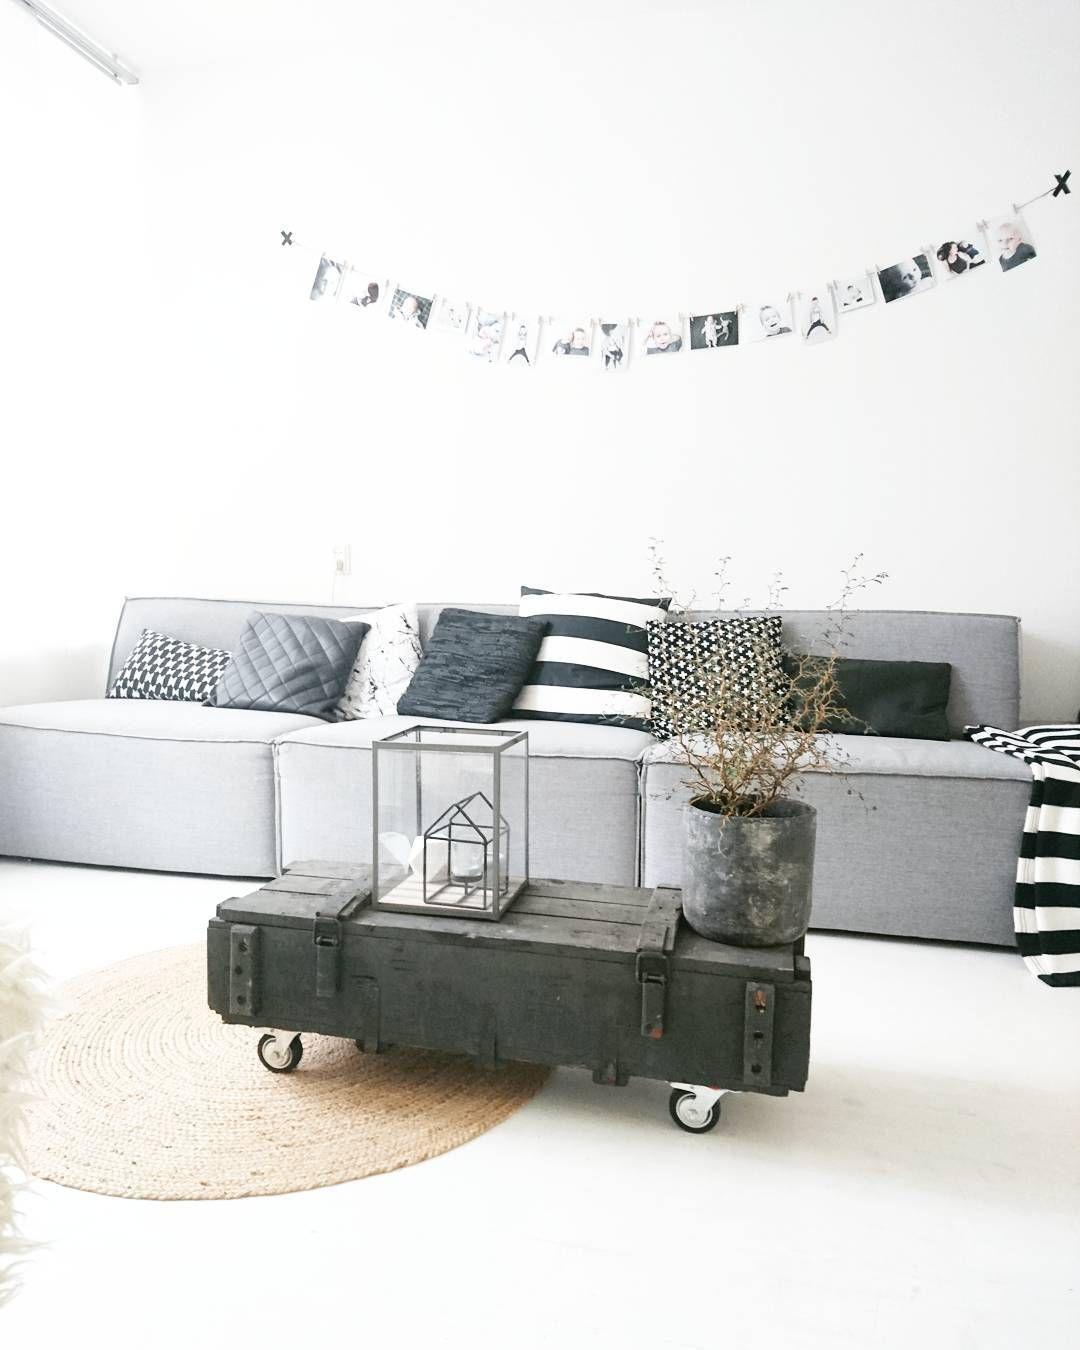 Sofa Bed Kwantum.Kwantuminhuis Vloerkleed Solis Https Www Kwantum Nl Vloer